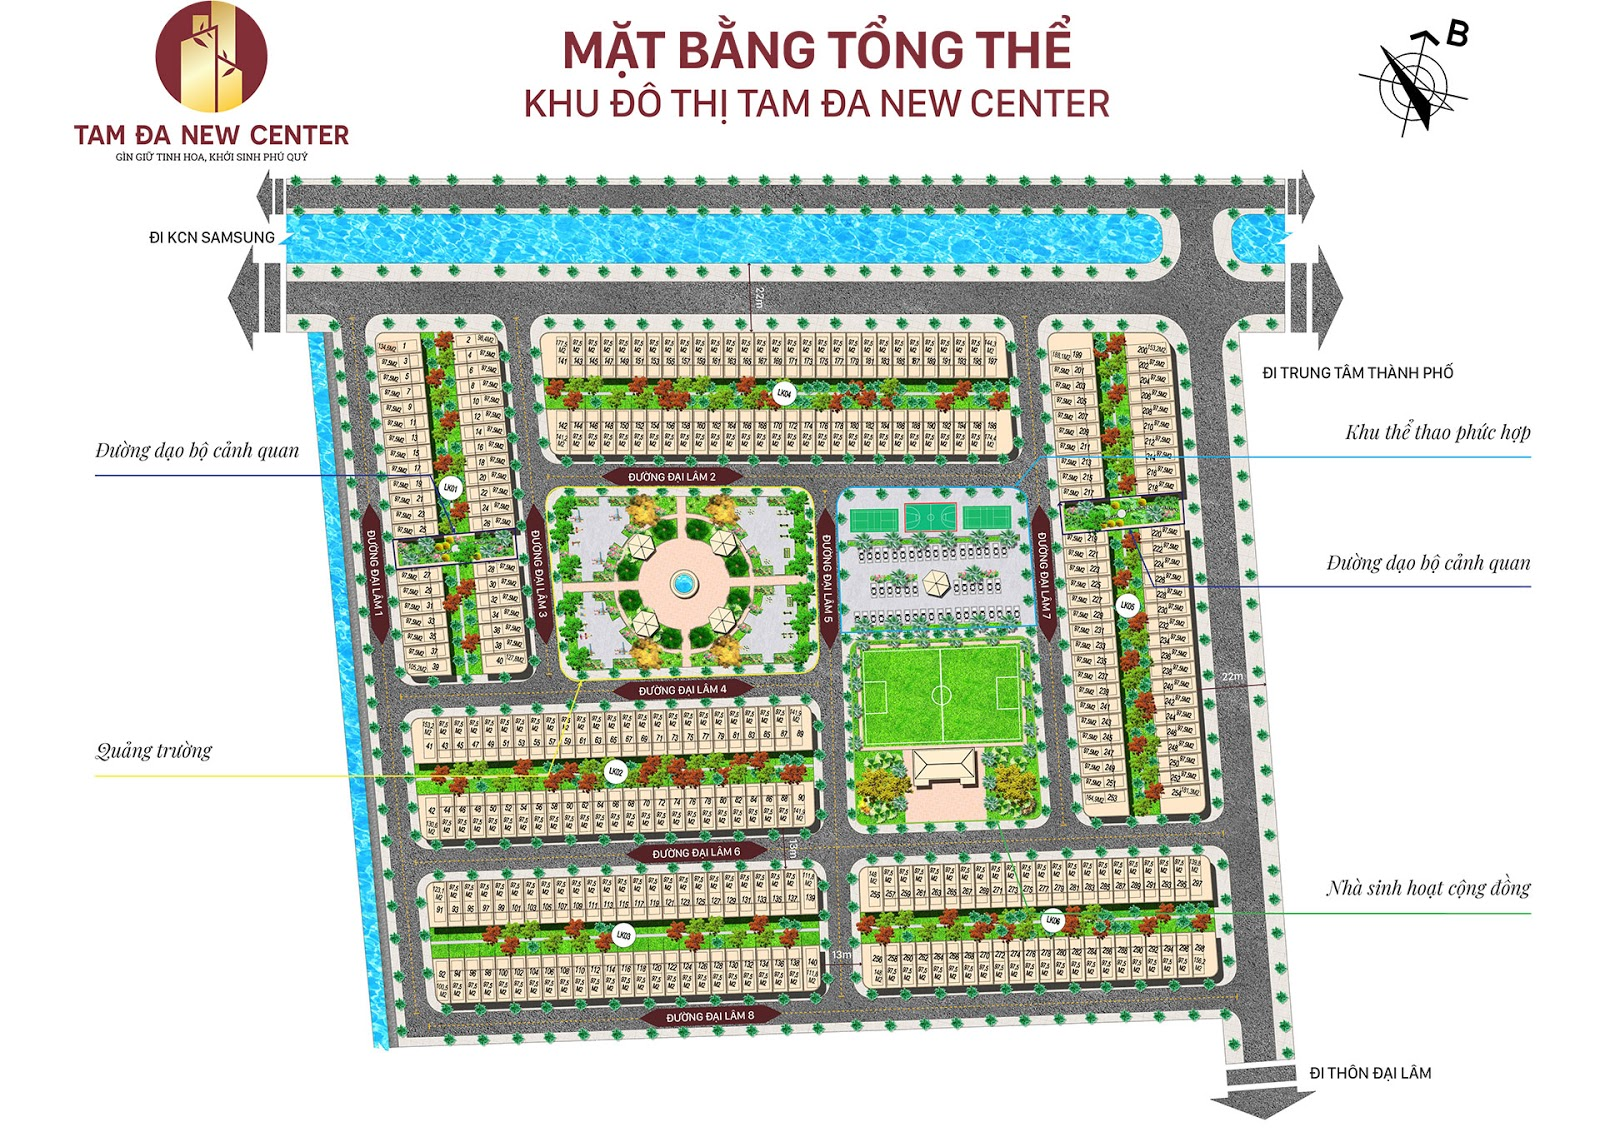 mat-bang-tam-da-new-center-bac-ninh